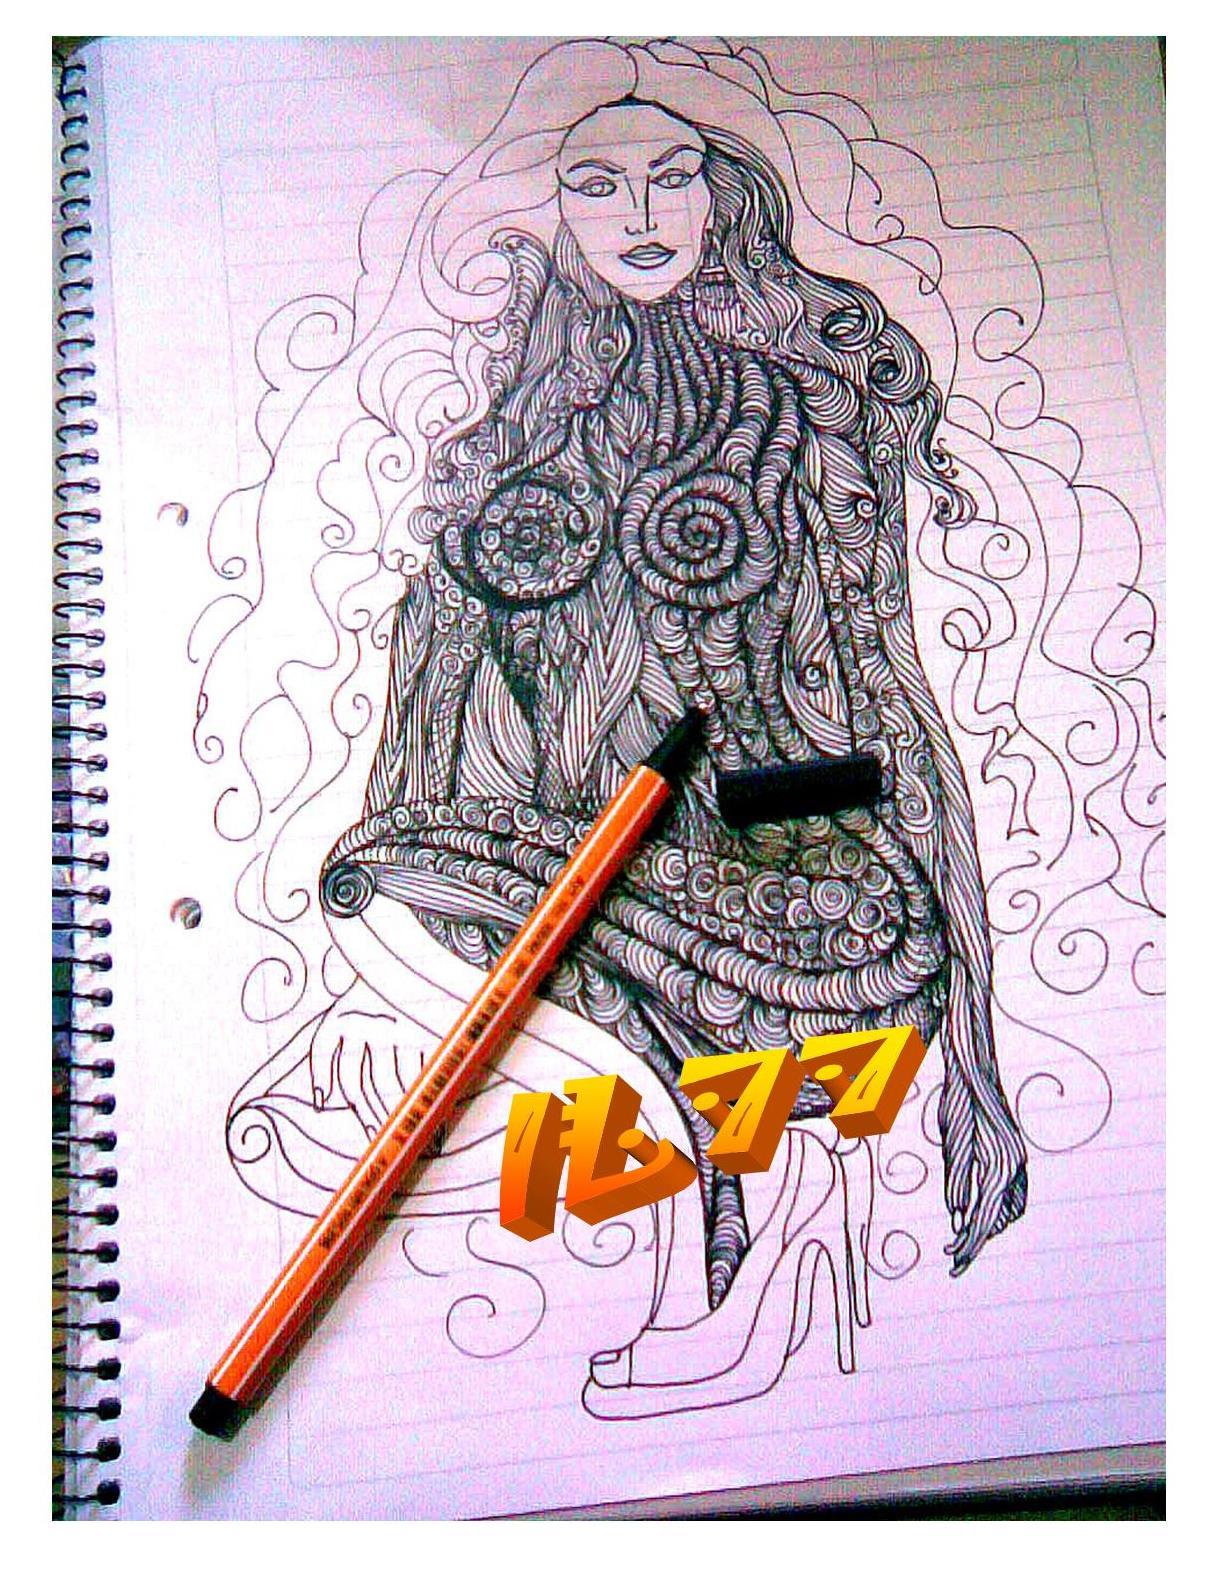 Mis primeros dibujos (Papel y Lapiz.)